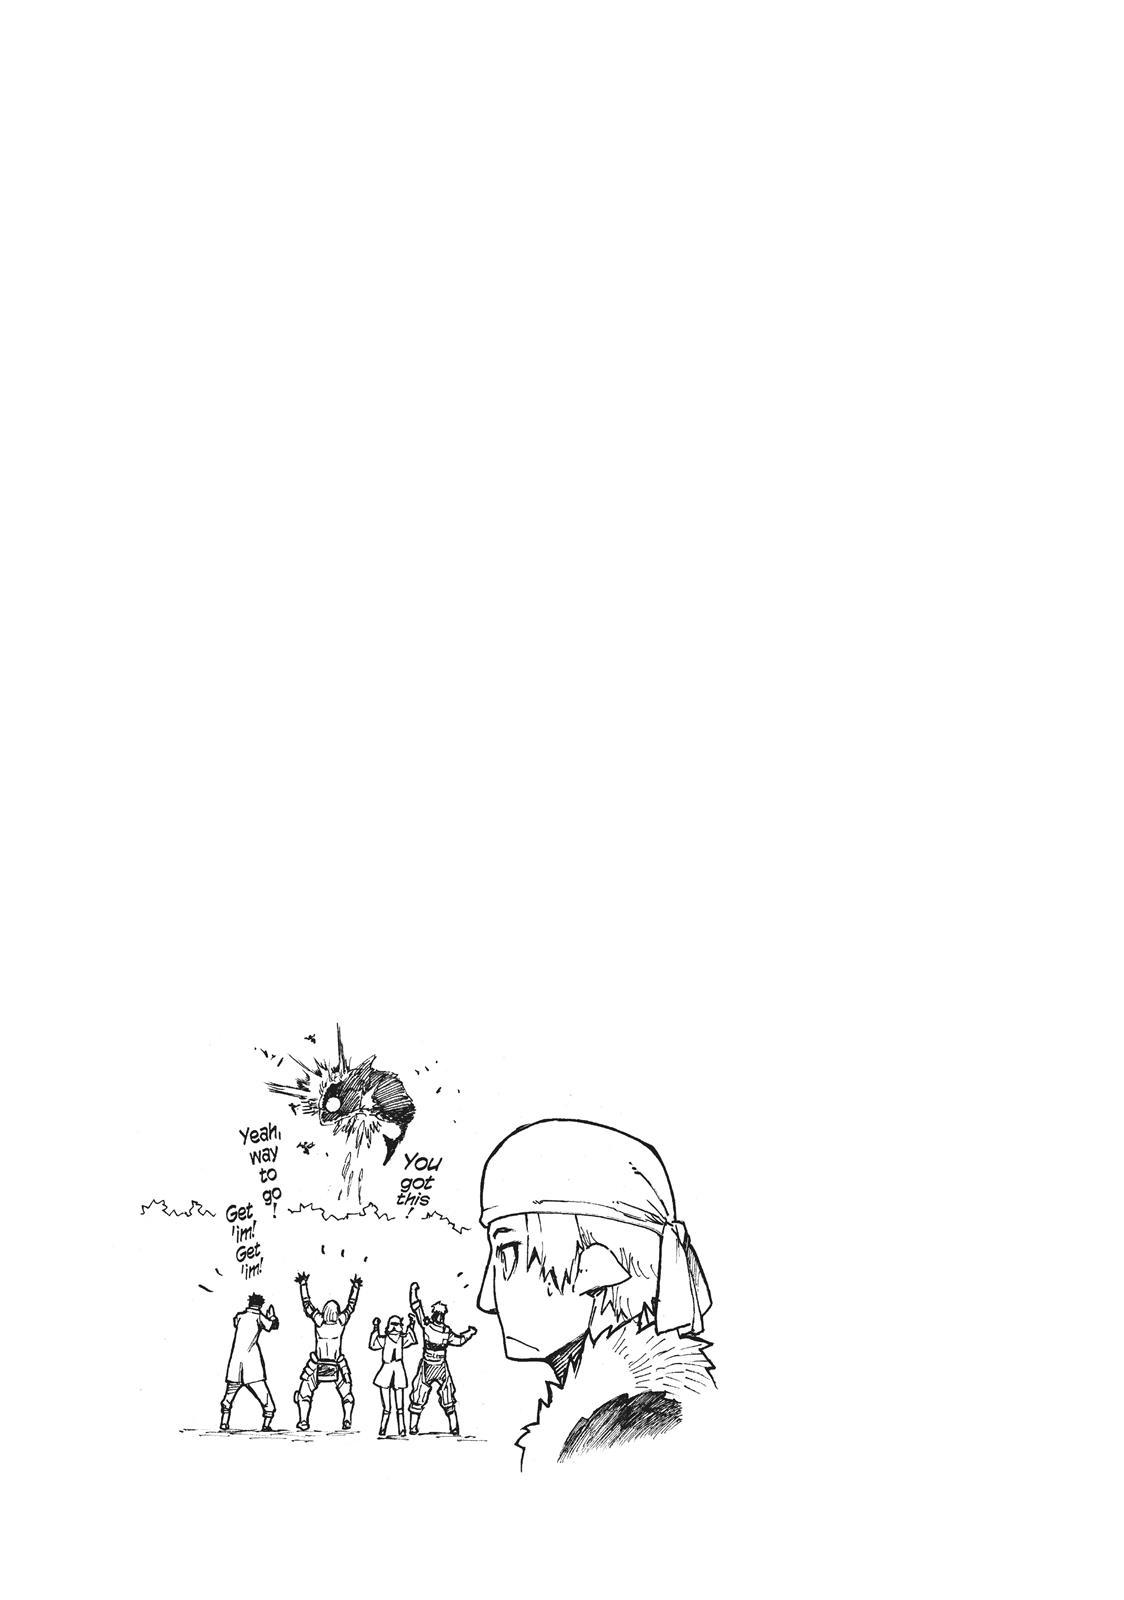 Tensei shitara Slime Datta Ken, Chapter 38 image 050